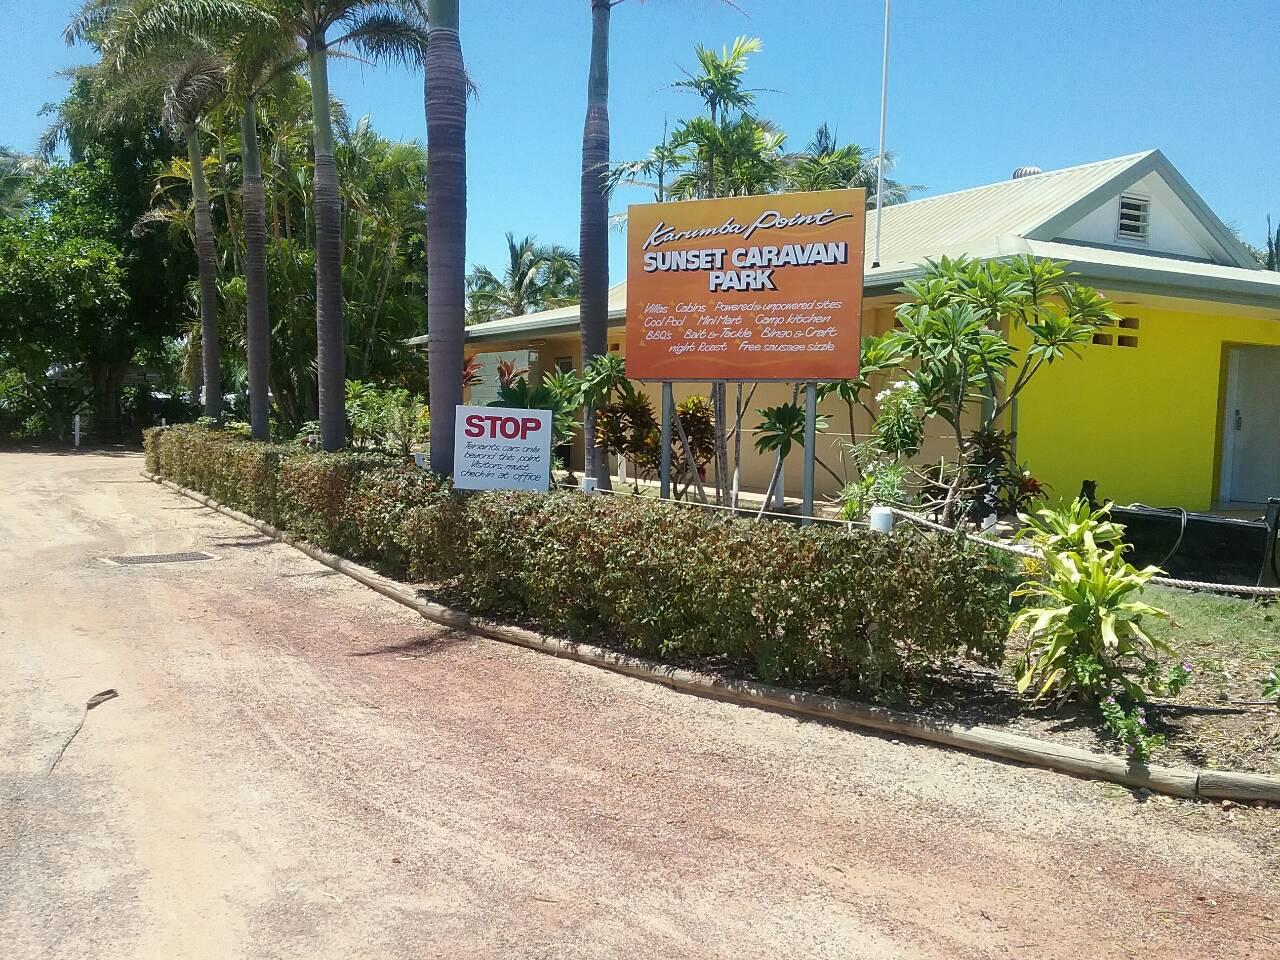 Park Entrance Karumba Point Sunset Caravan Park